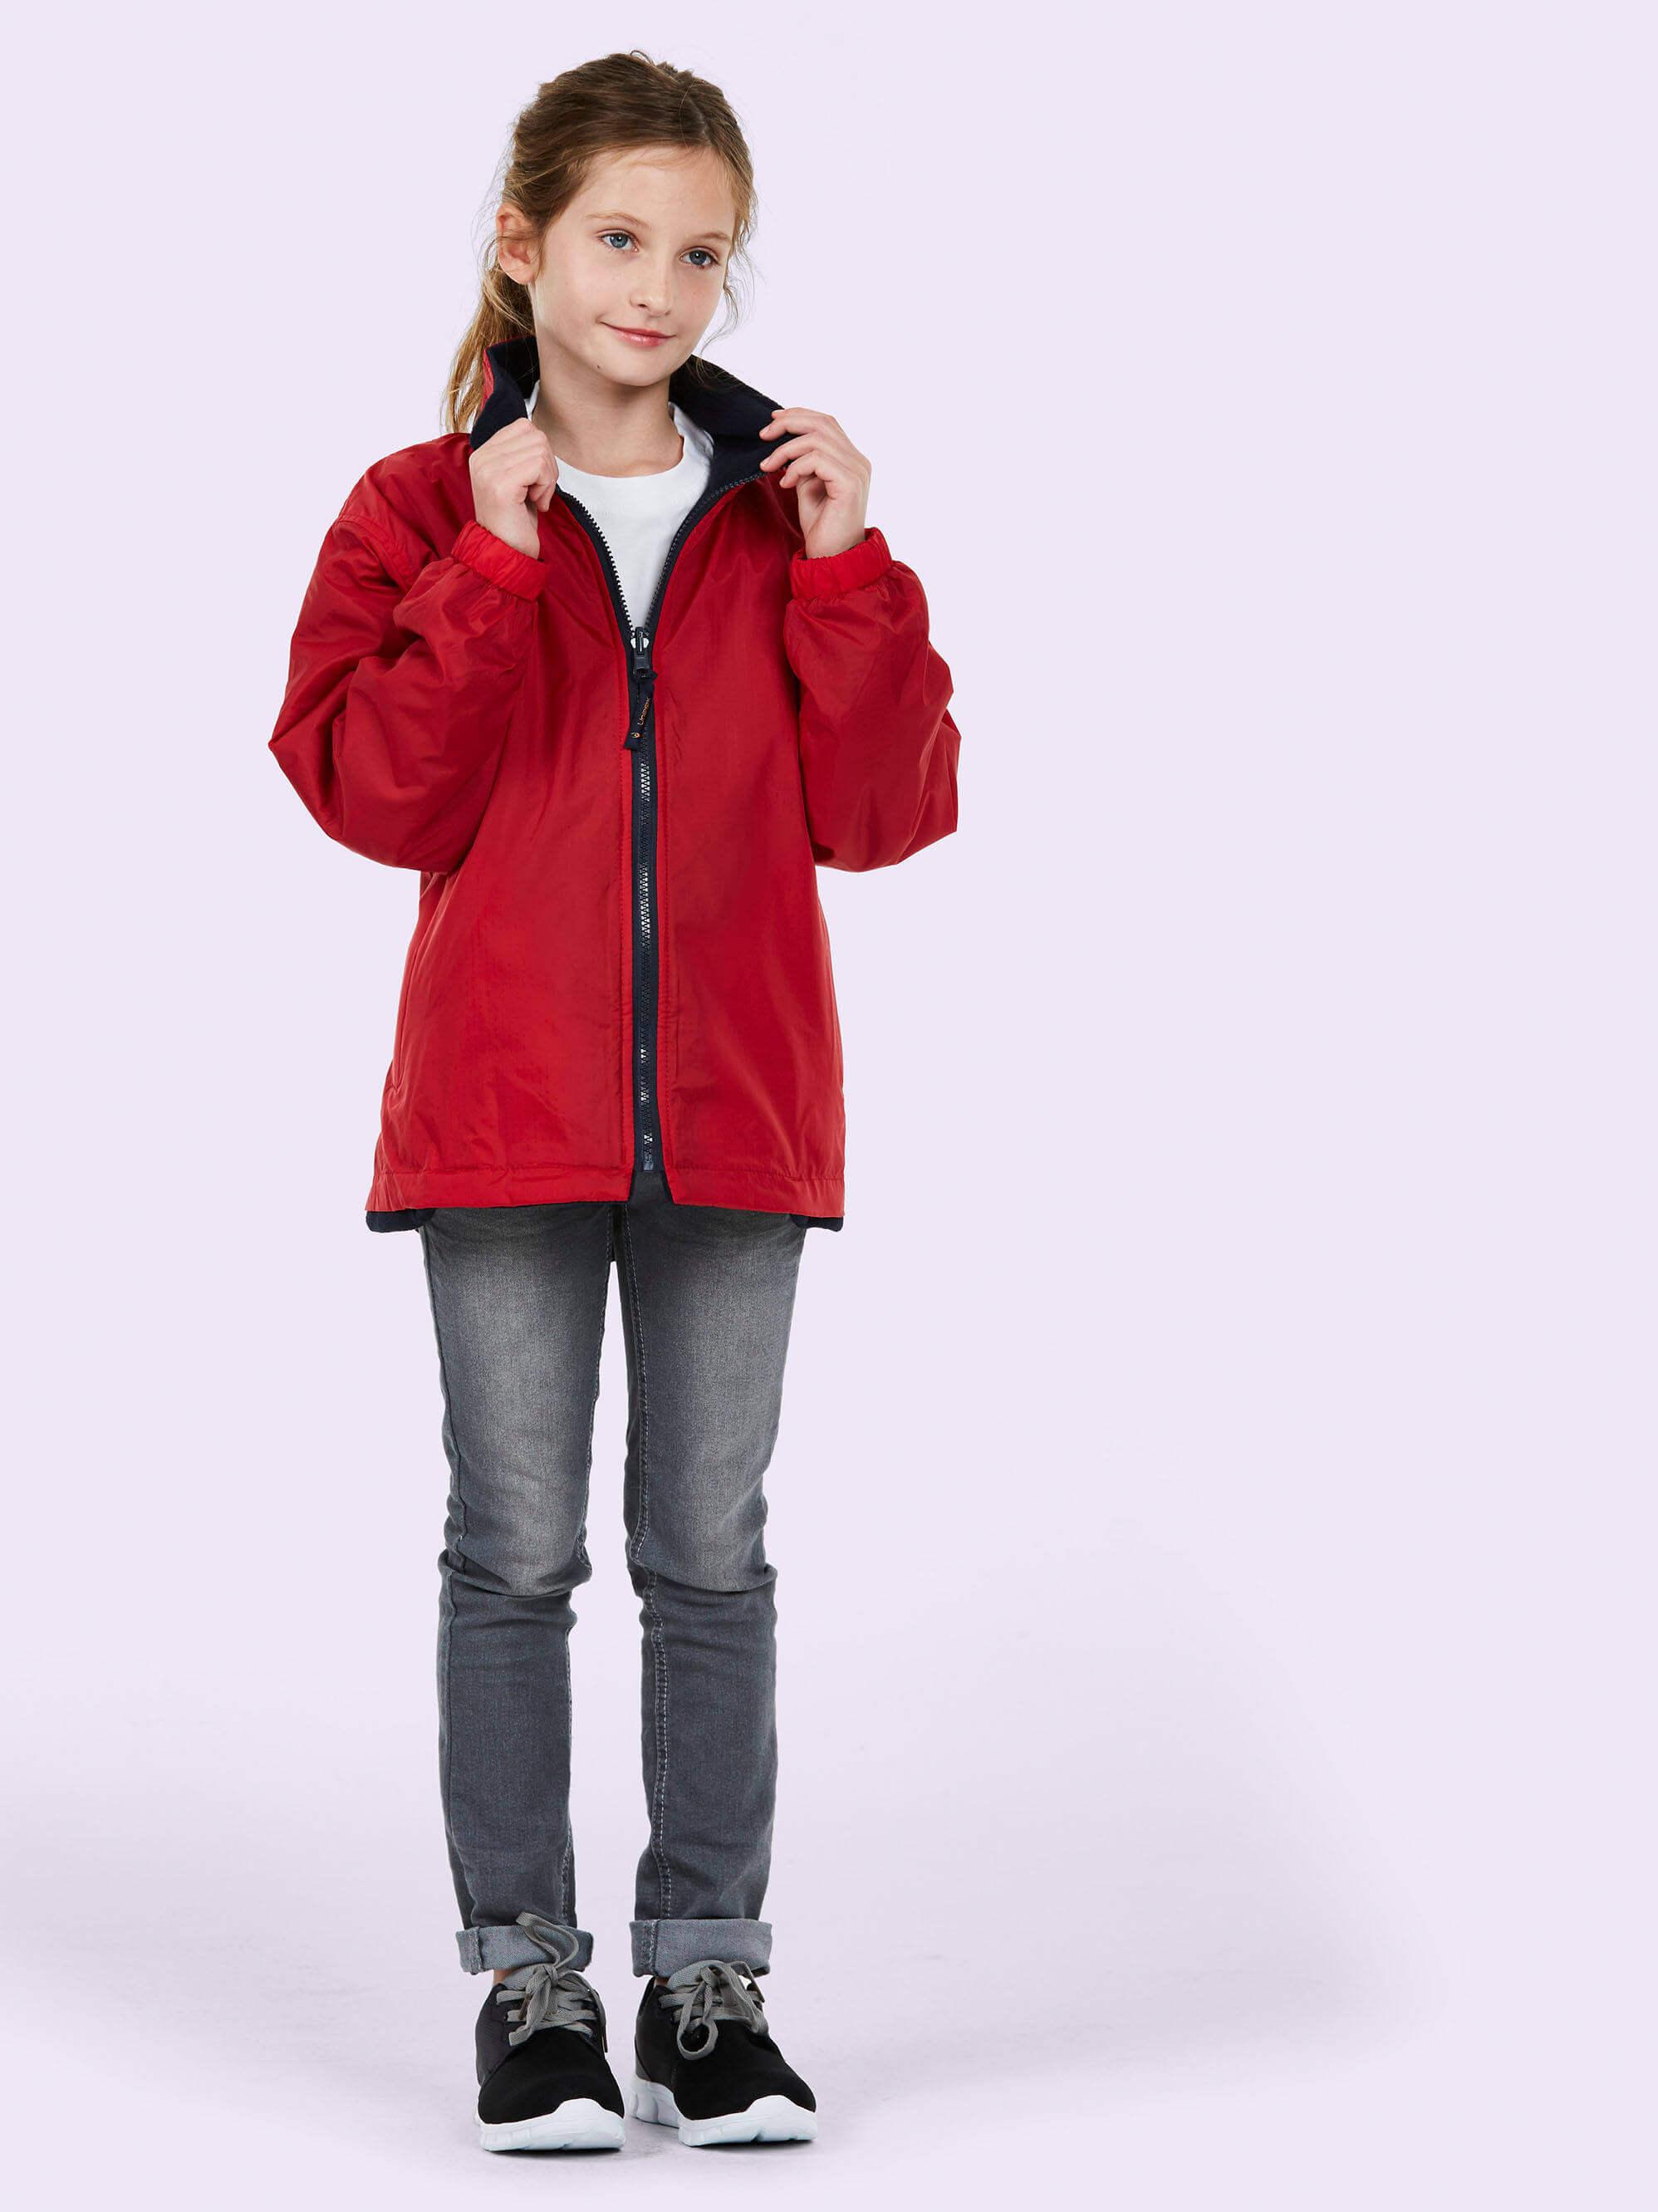 7b8b365ab Uneek Childrens Reversible Fleece